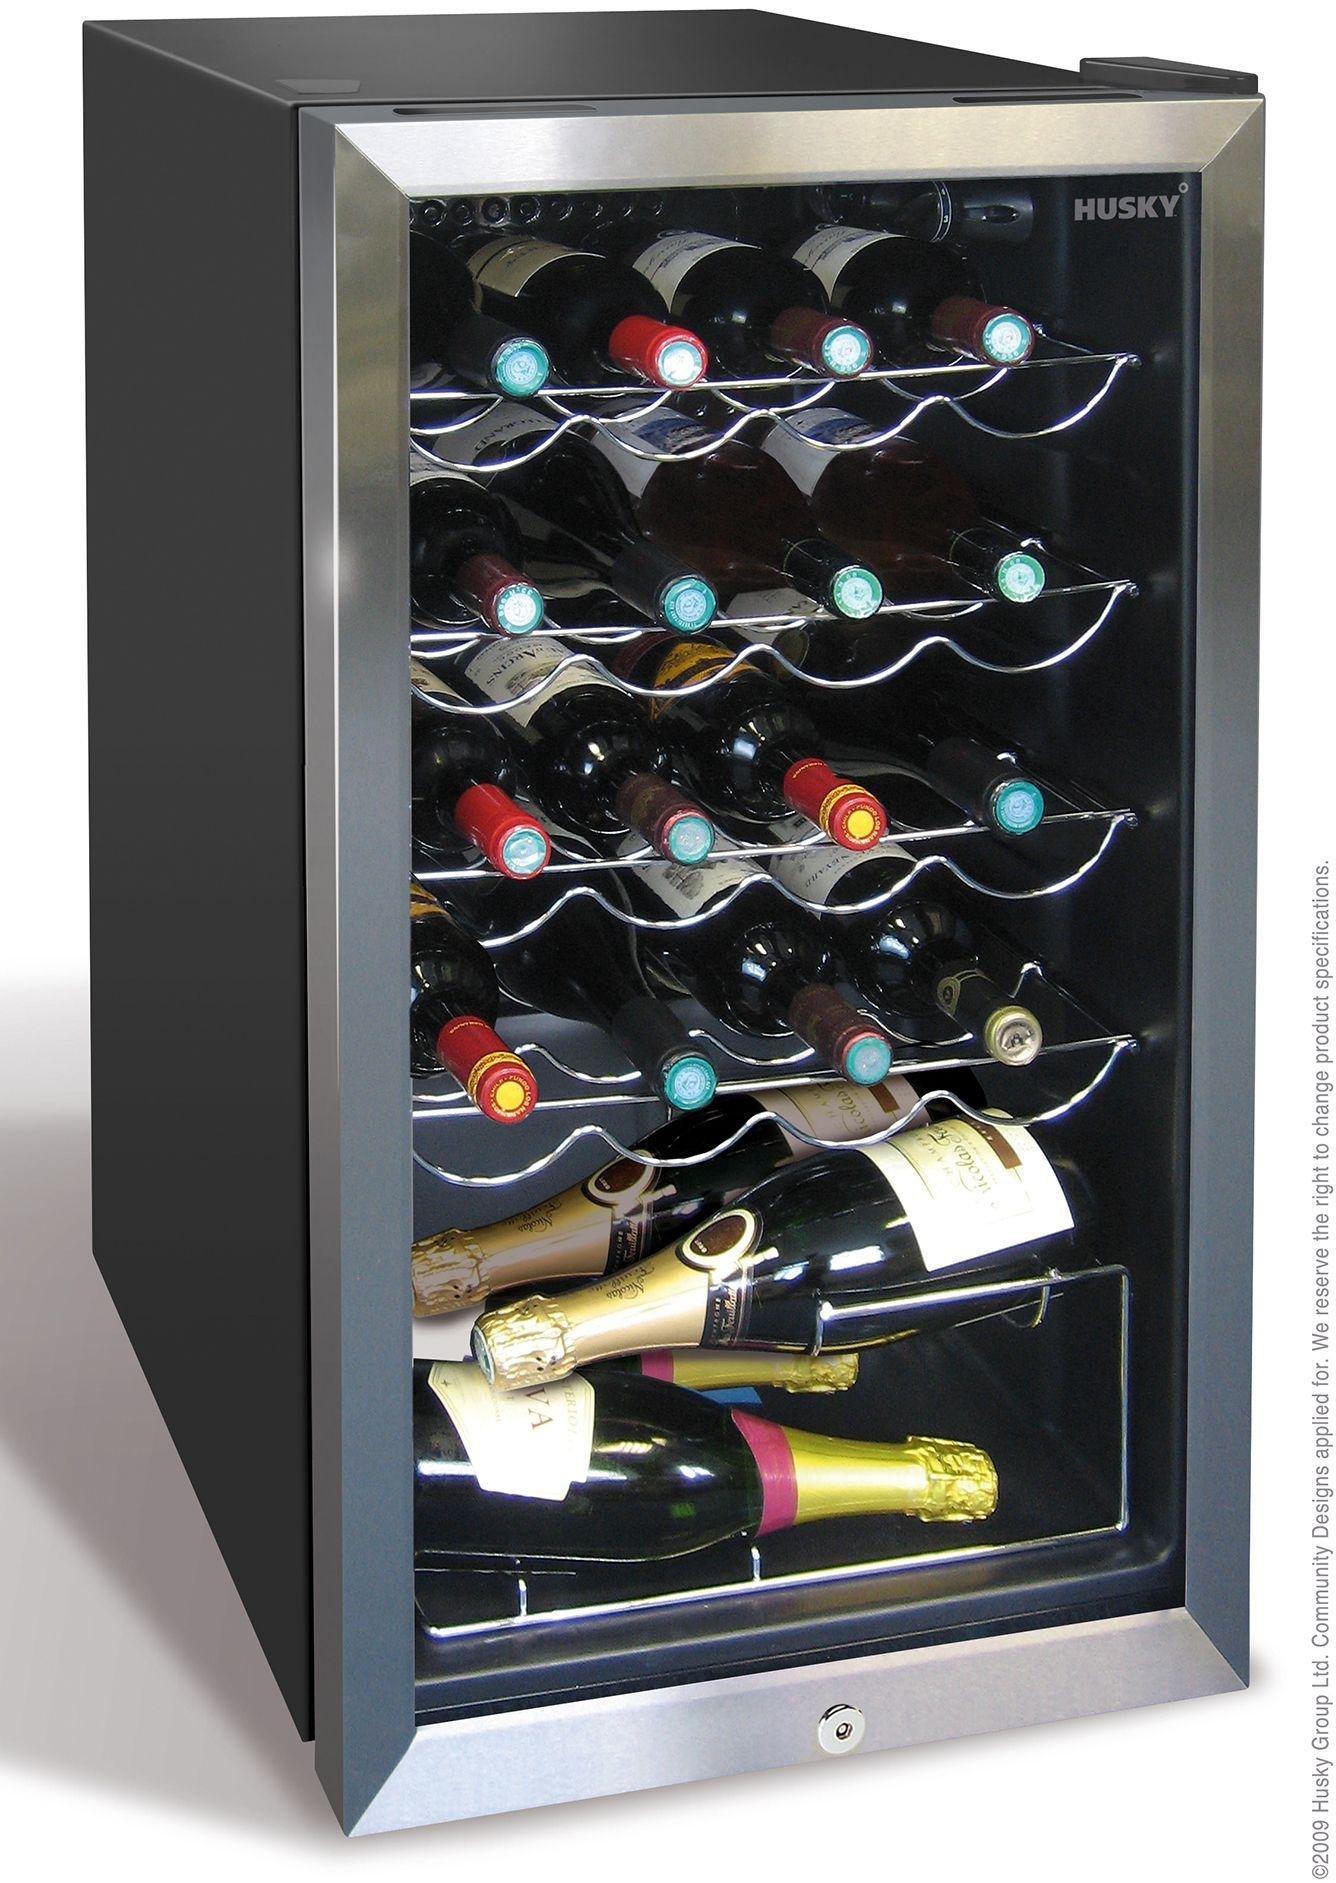 husky hm39 under counter wine cooler black - Under Counter Wine Fridge